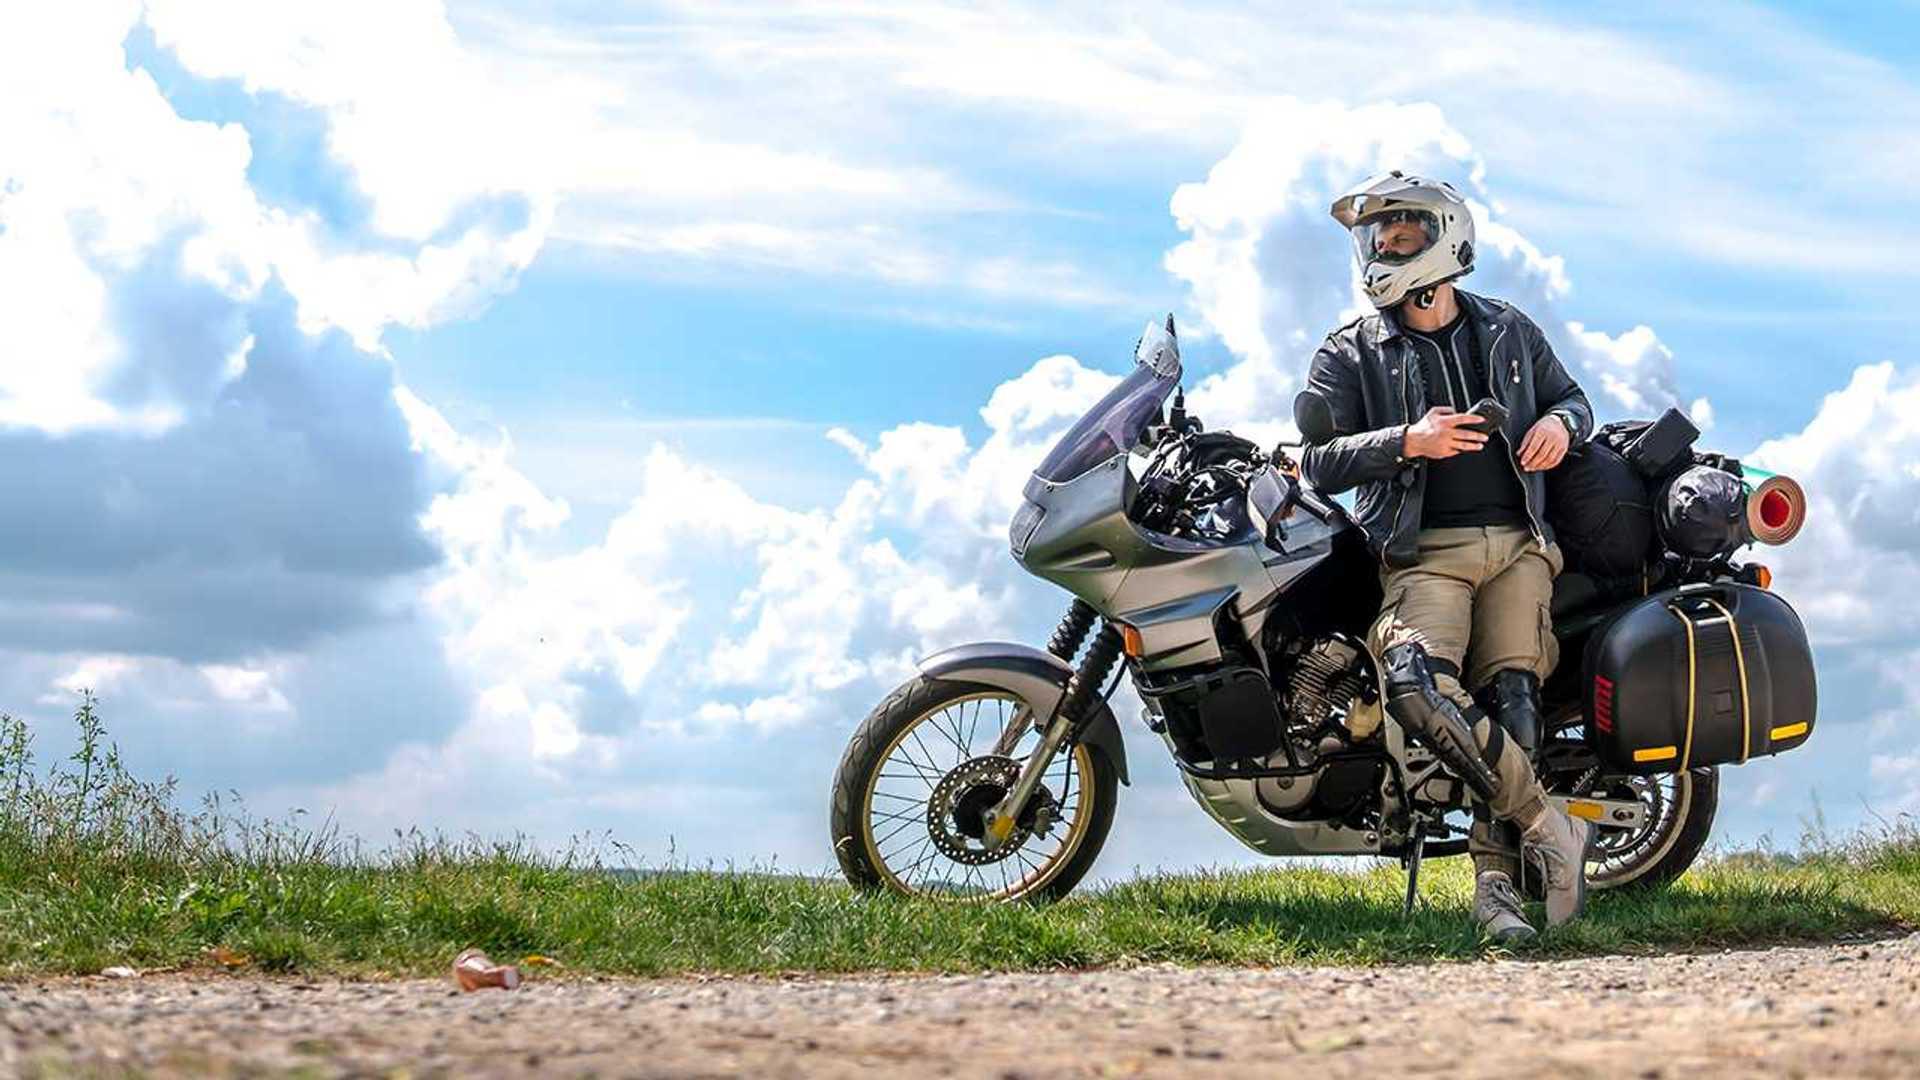 5 Best Motorcycle Insurance Companies (2021)